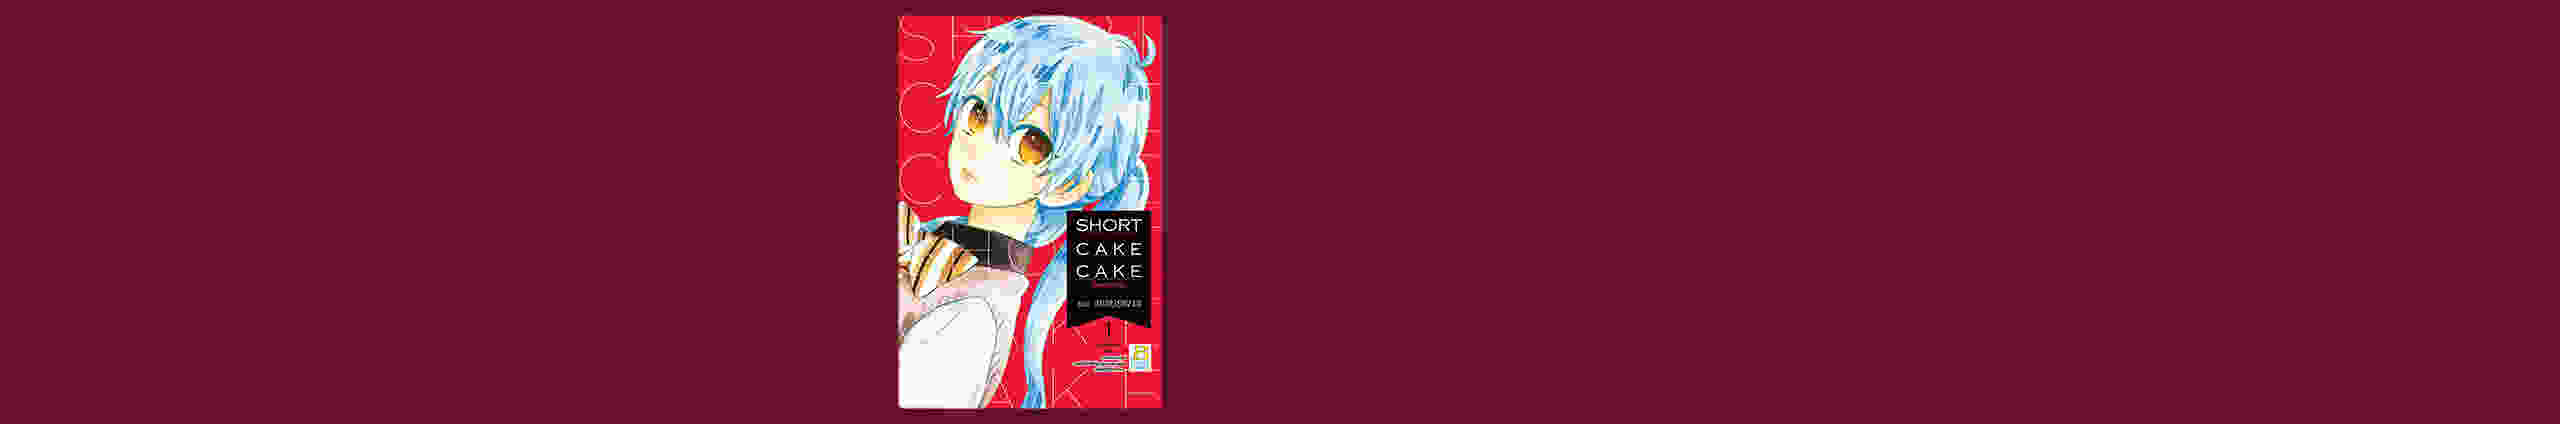 SHORT CAKE CAKE ช็อตเค้กสื่อรัก